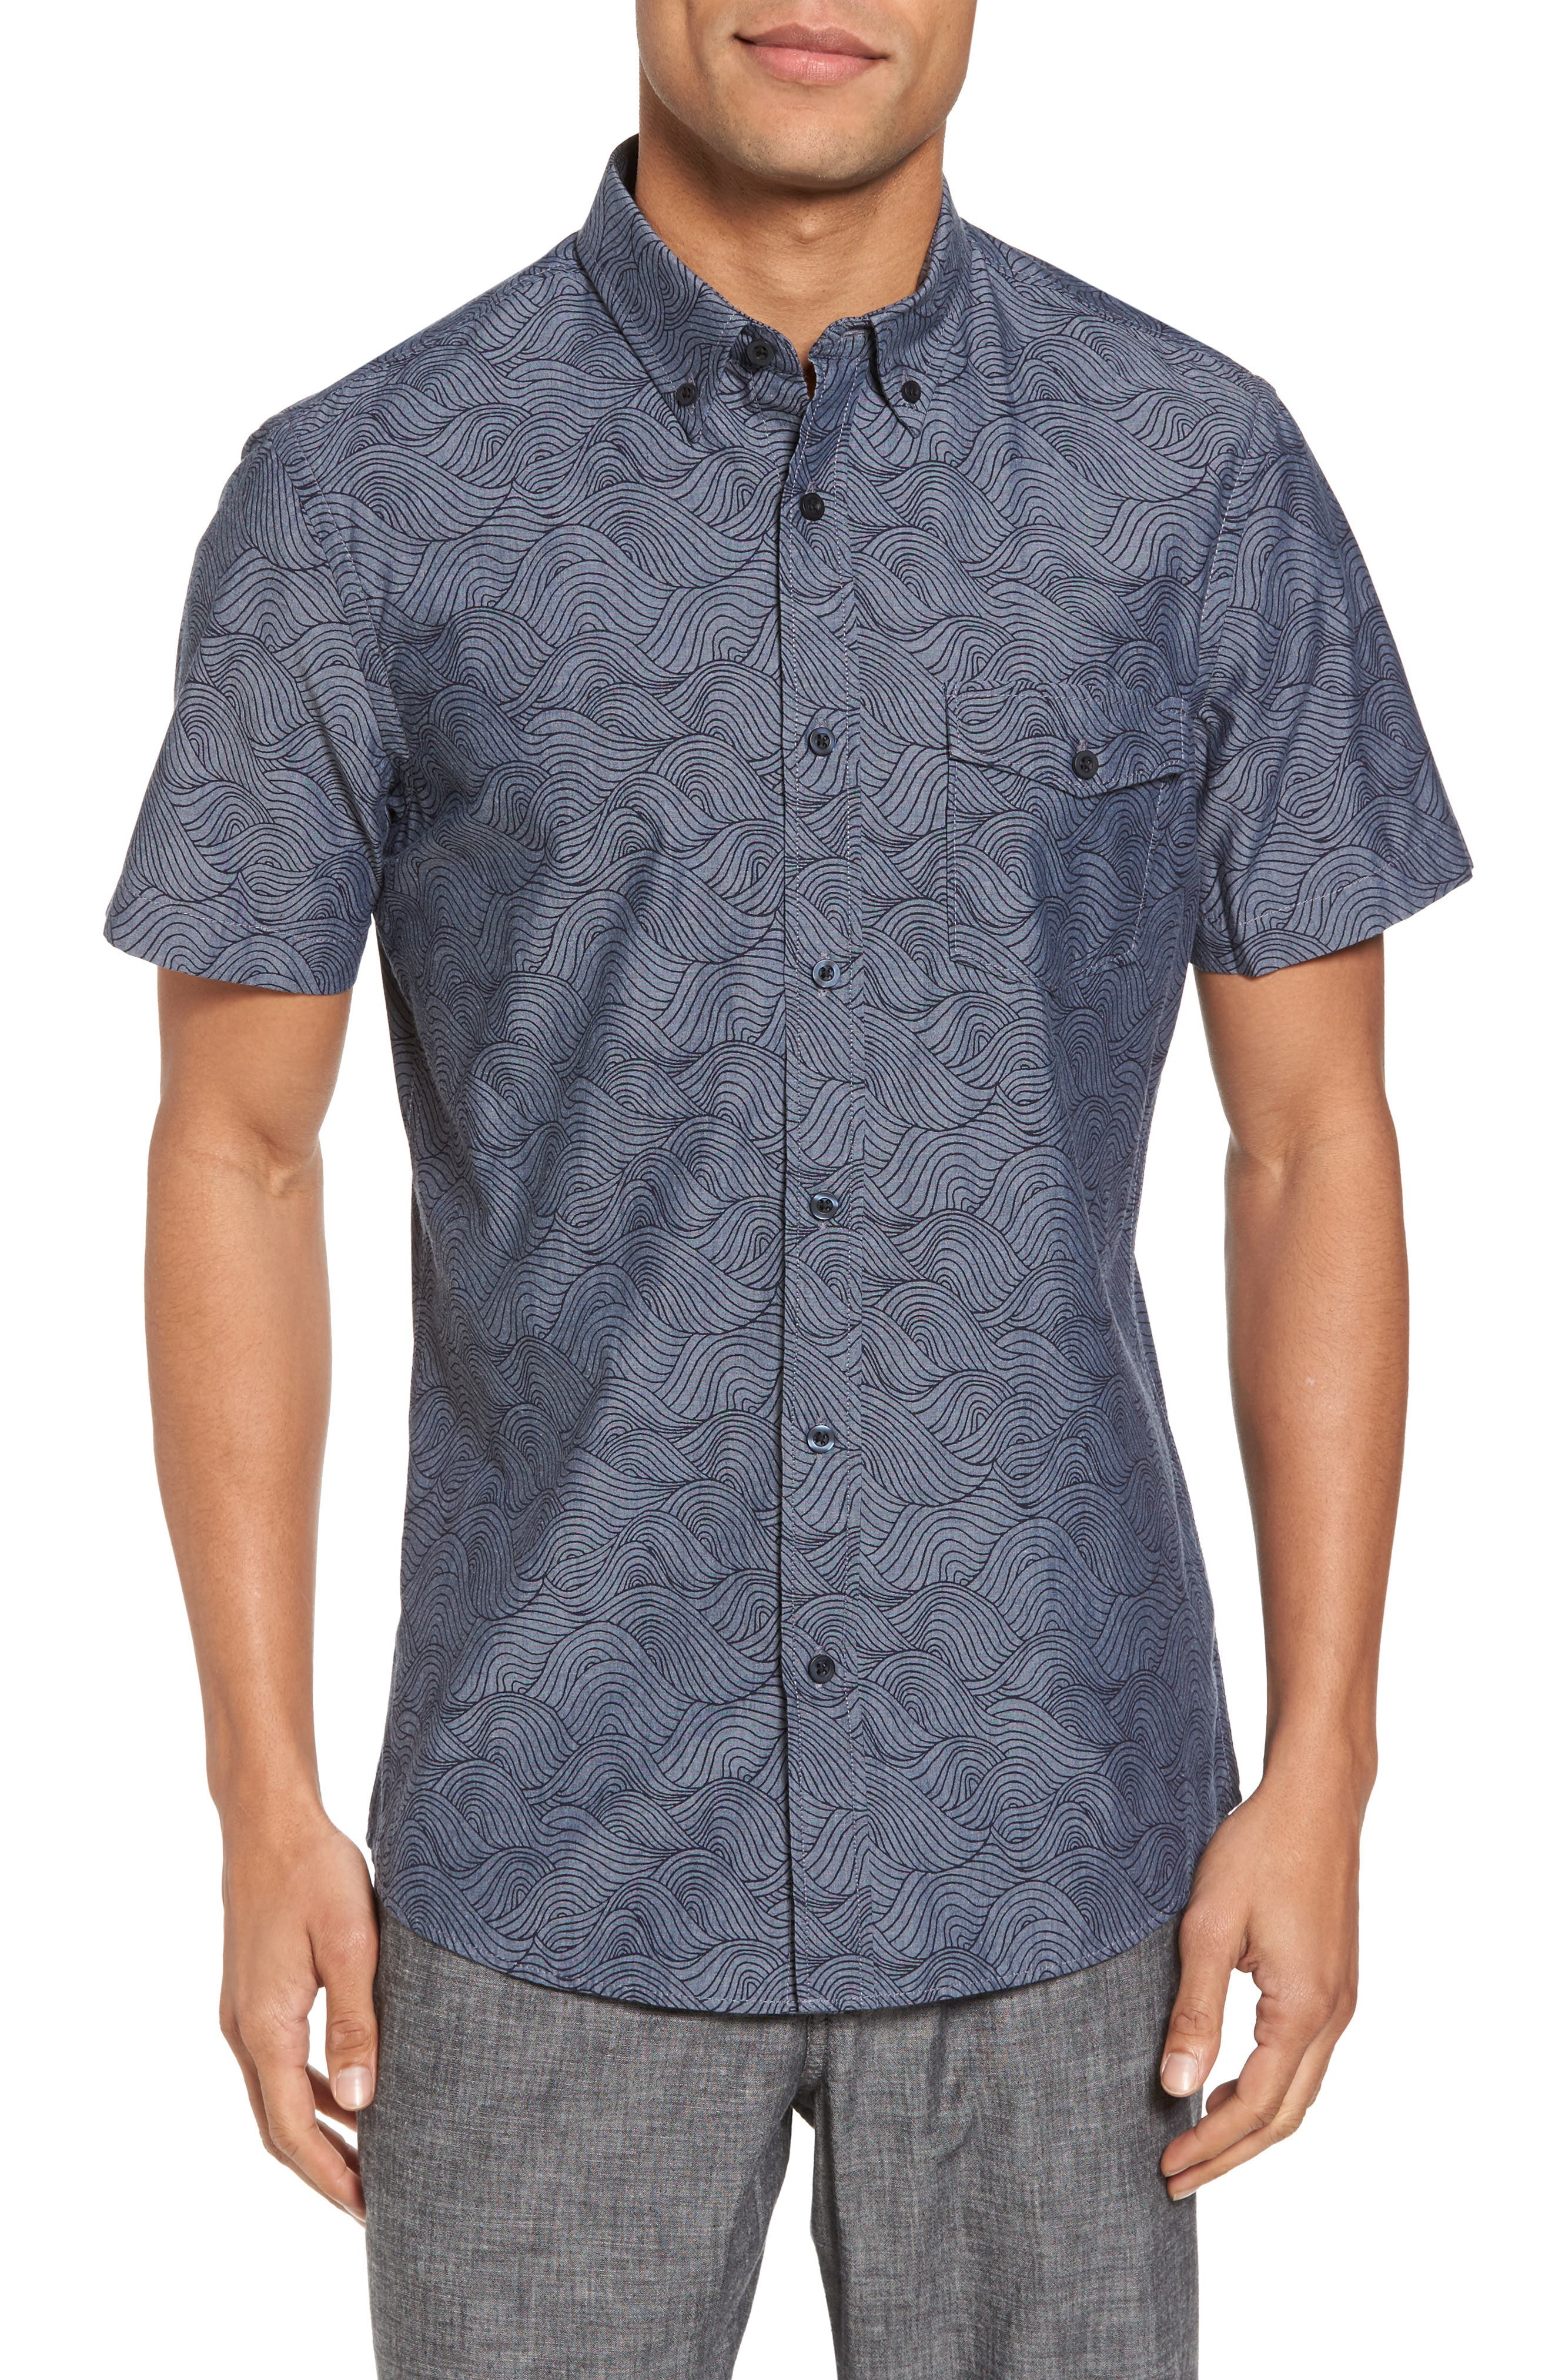 Trim Fit Ivy Print Sport Shirt,                             Main thumbnail 1, color,                             Grey Onyx Rolling Waves